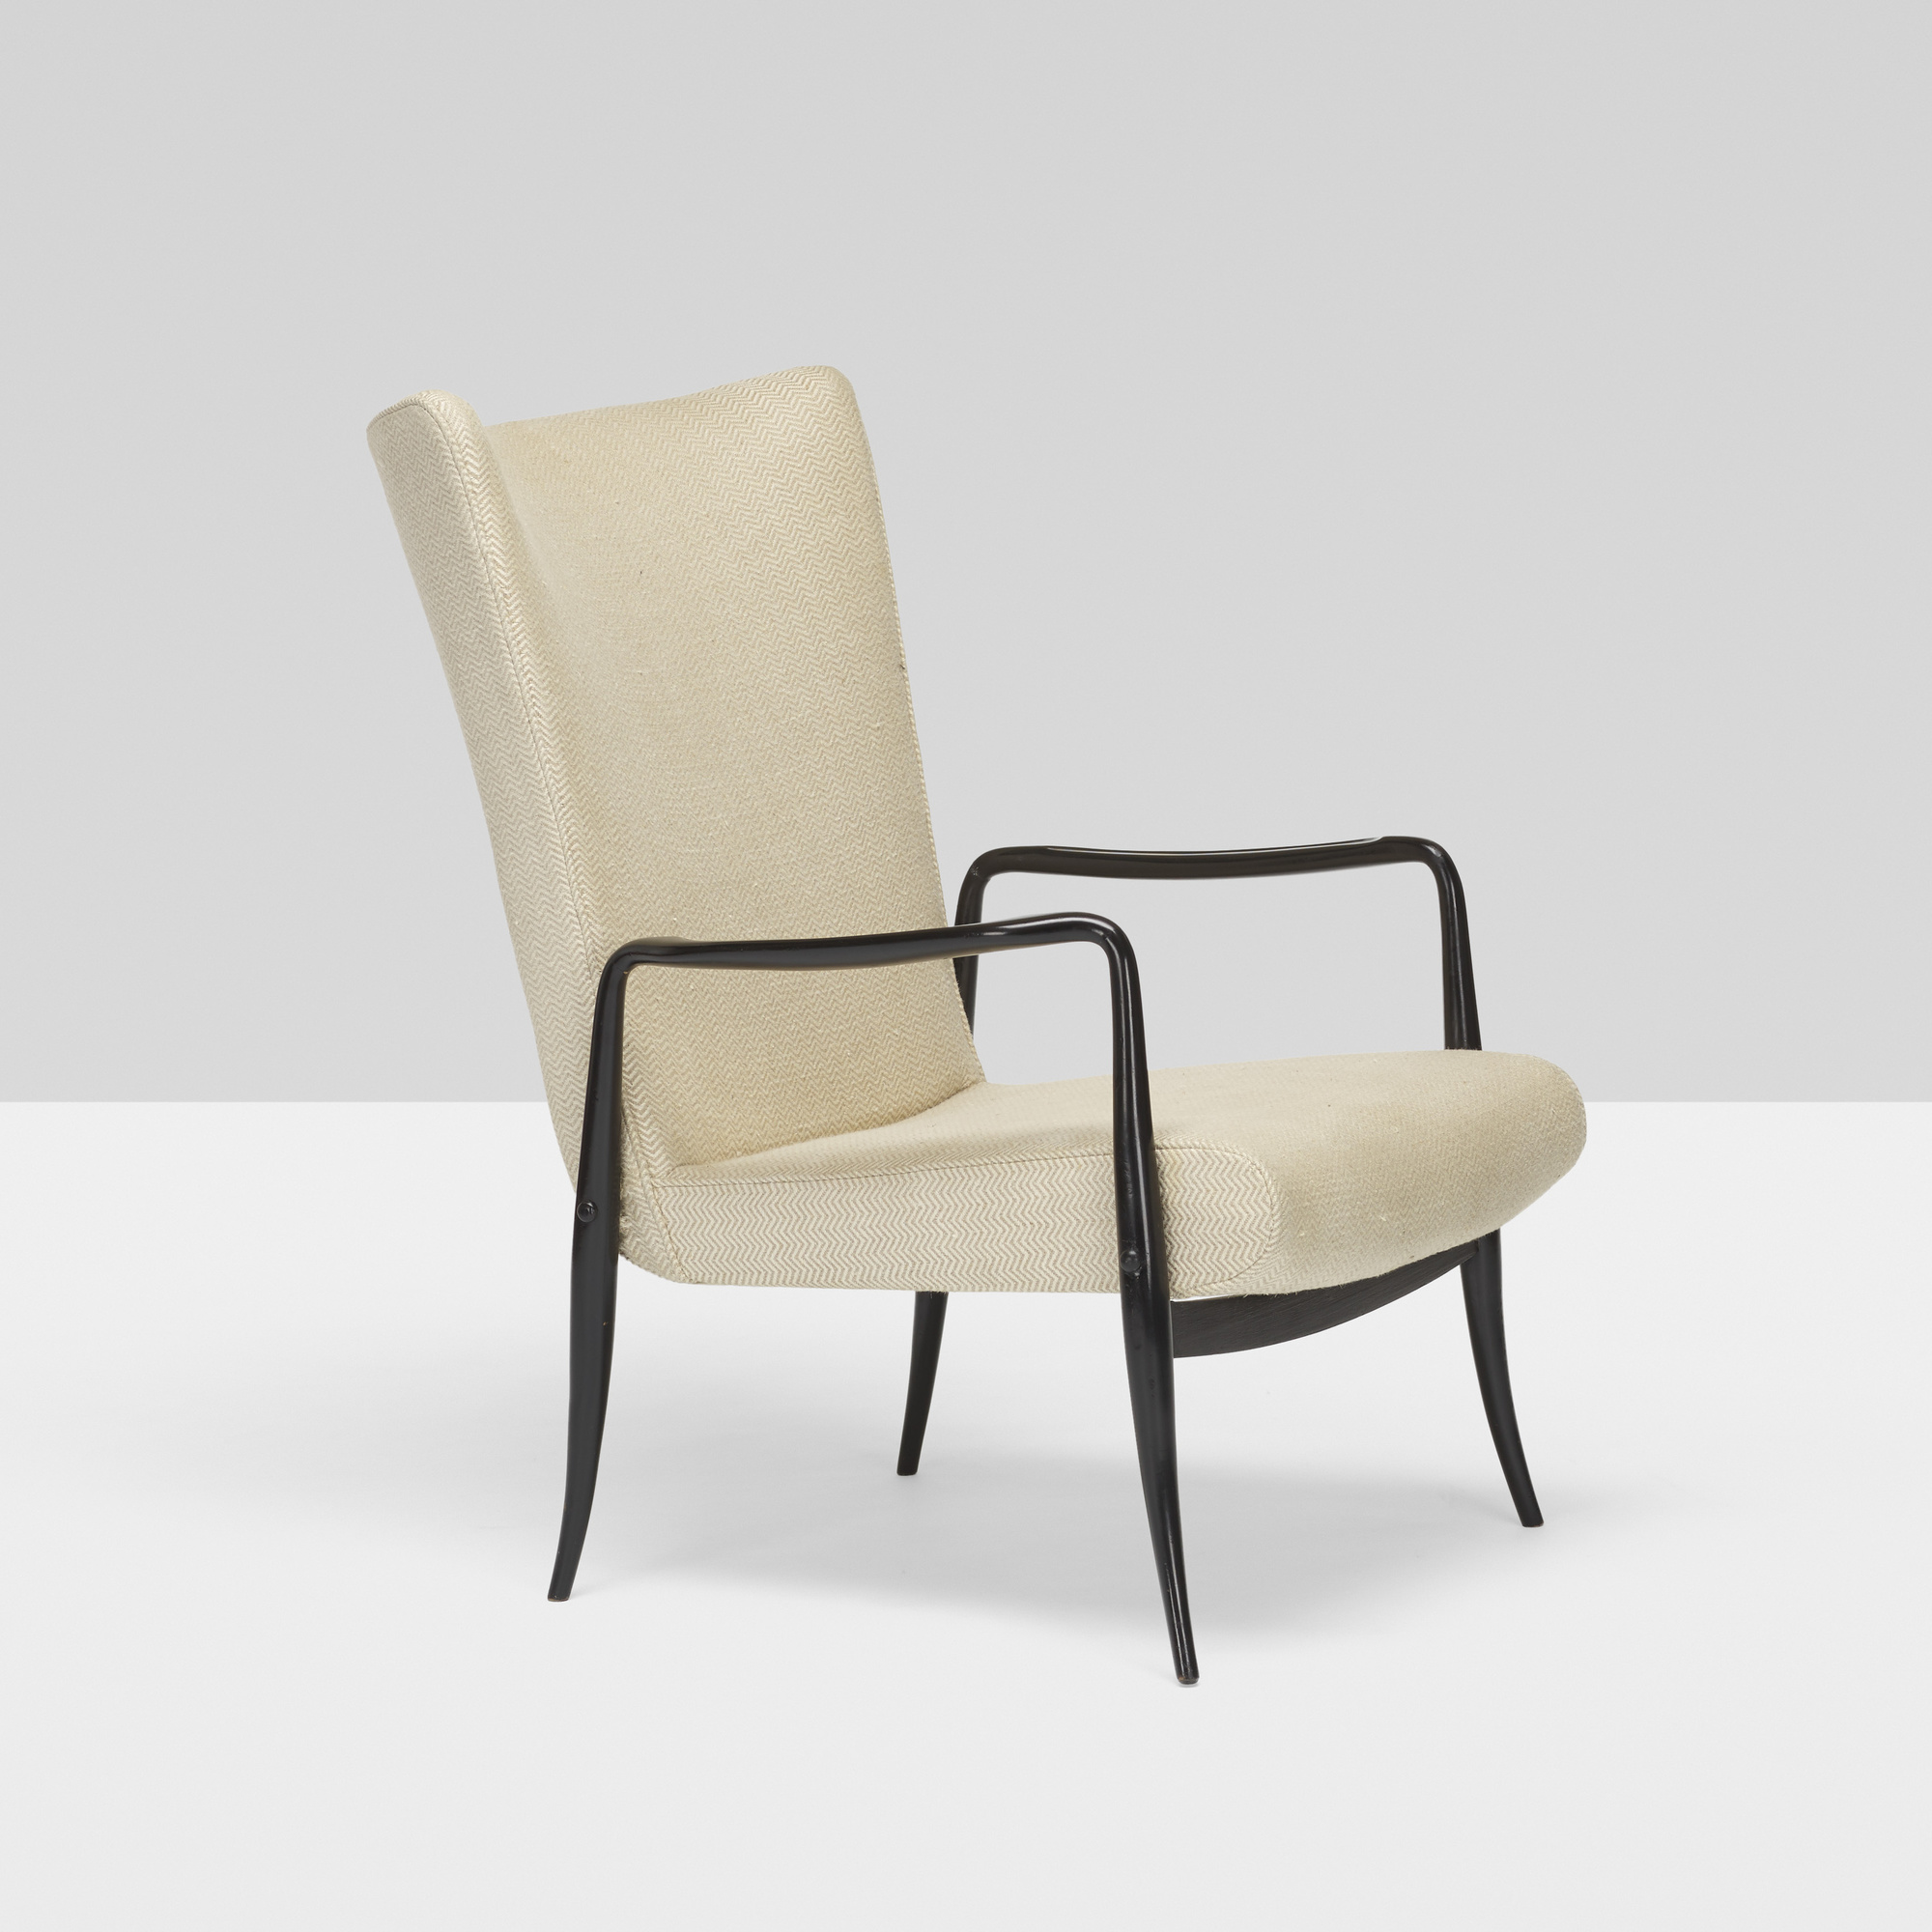 173: Brazilian / lounge chair (1 of 3)